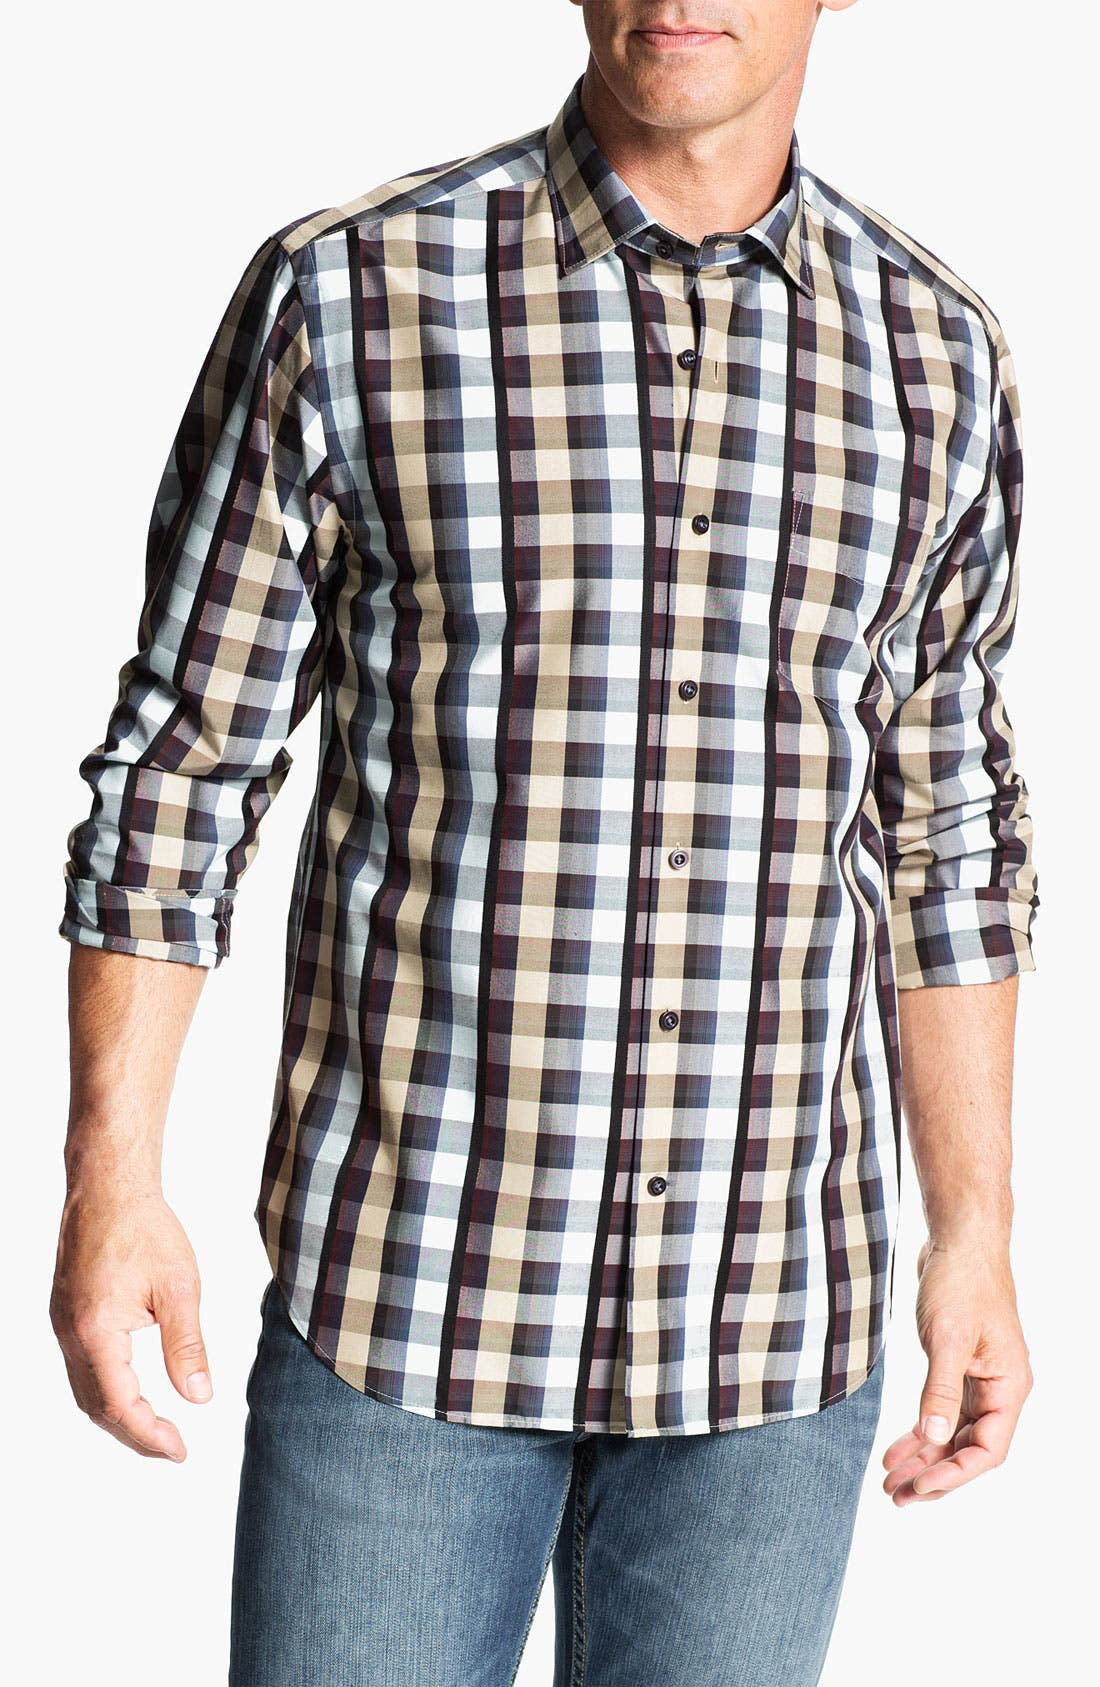 Main Image - Tommy Bahama 'Esprit de Coeur' Silk Sport Shirt